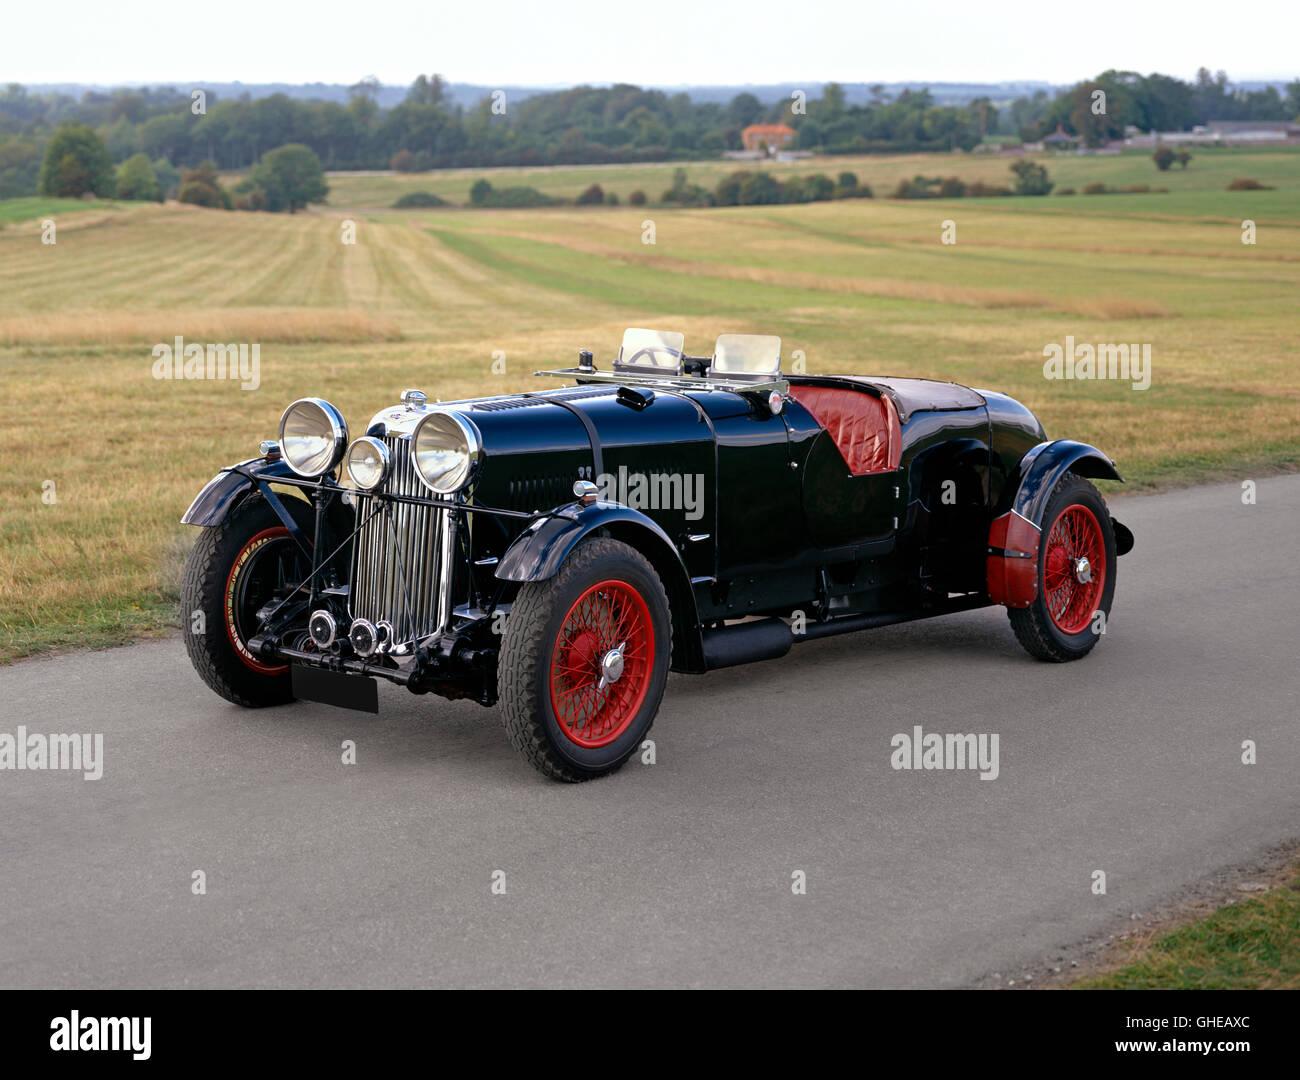 1934 35 Lagonda LG45R 4 5 litre team car Country of origin United Kingdom - Stock Image